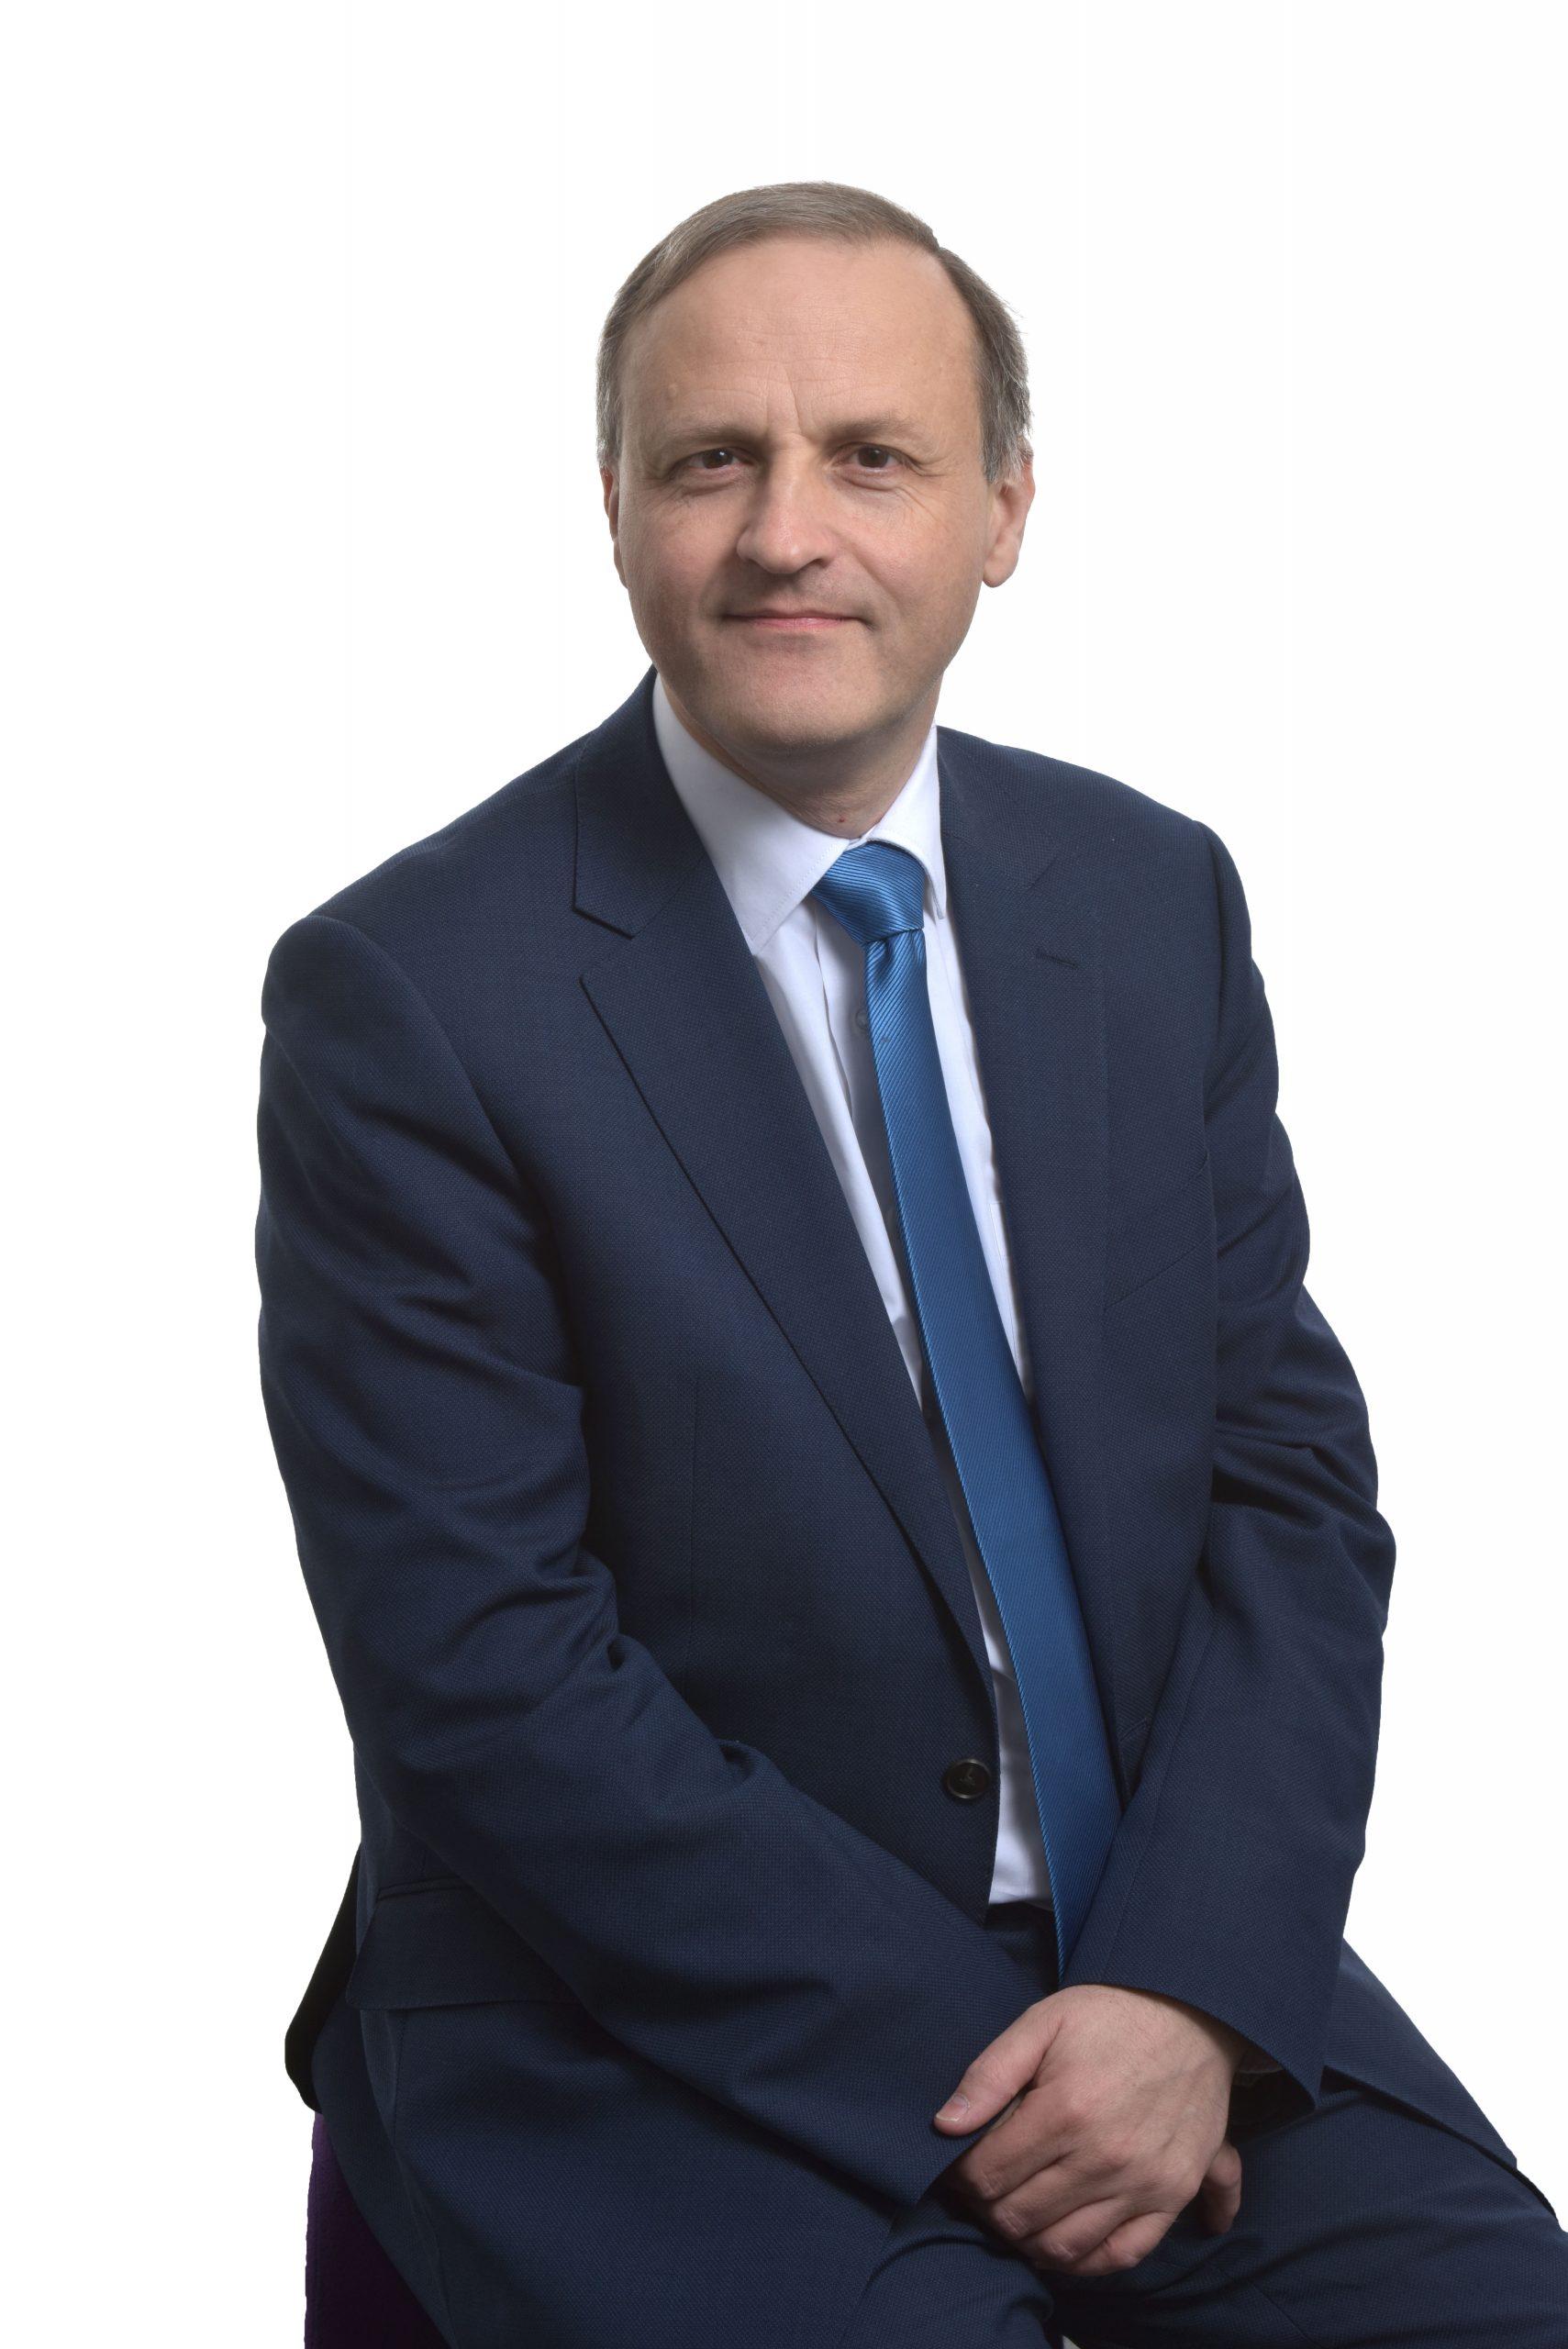 Sir Steve Webb